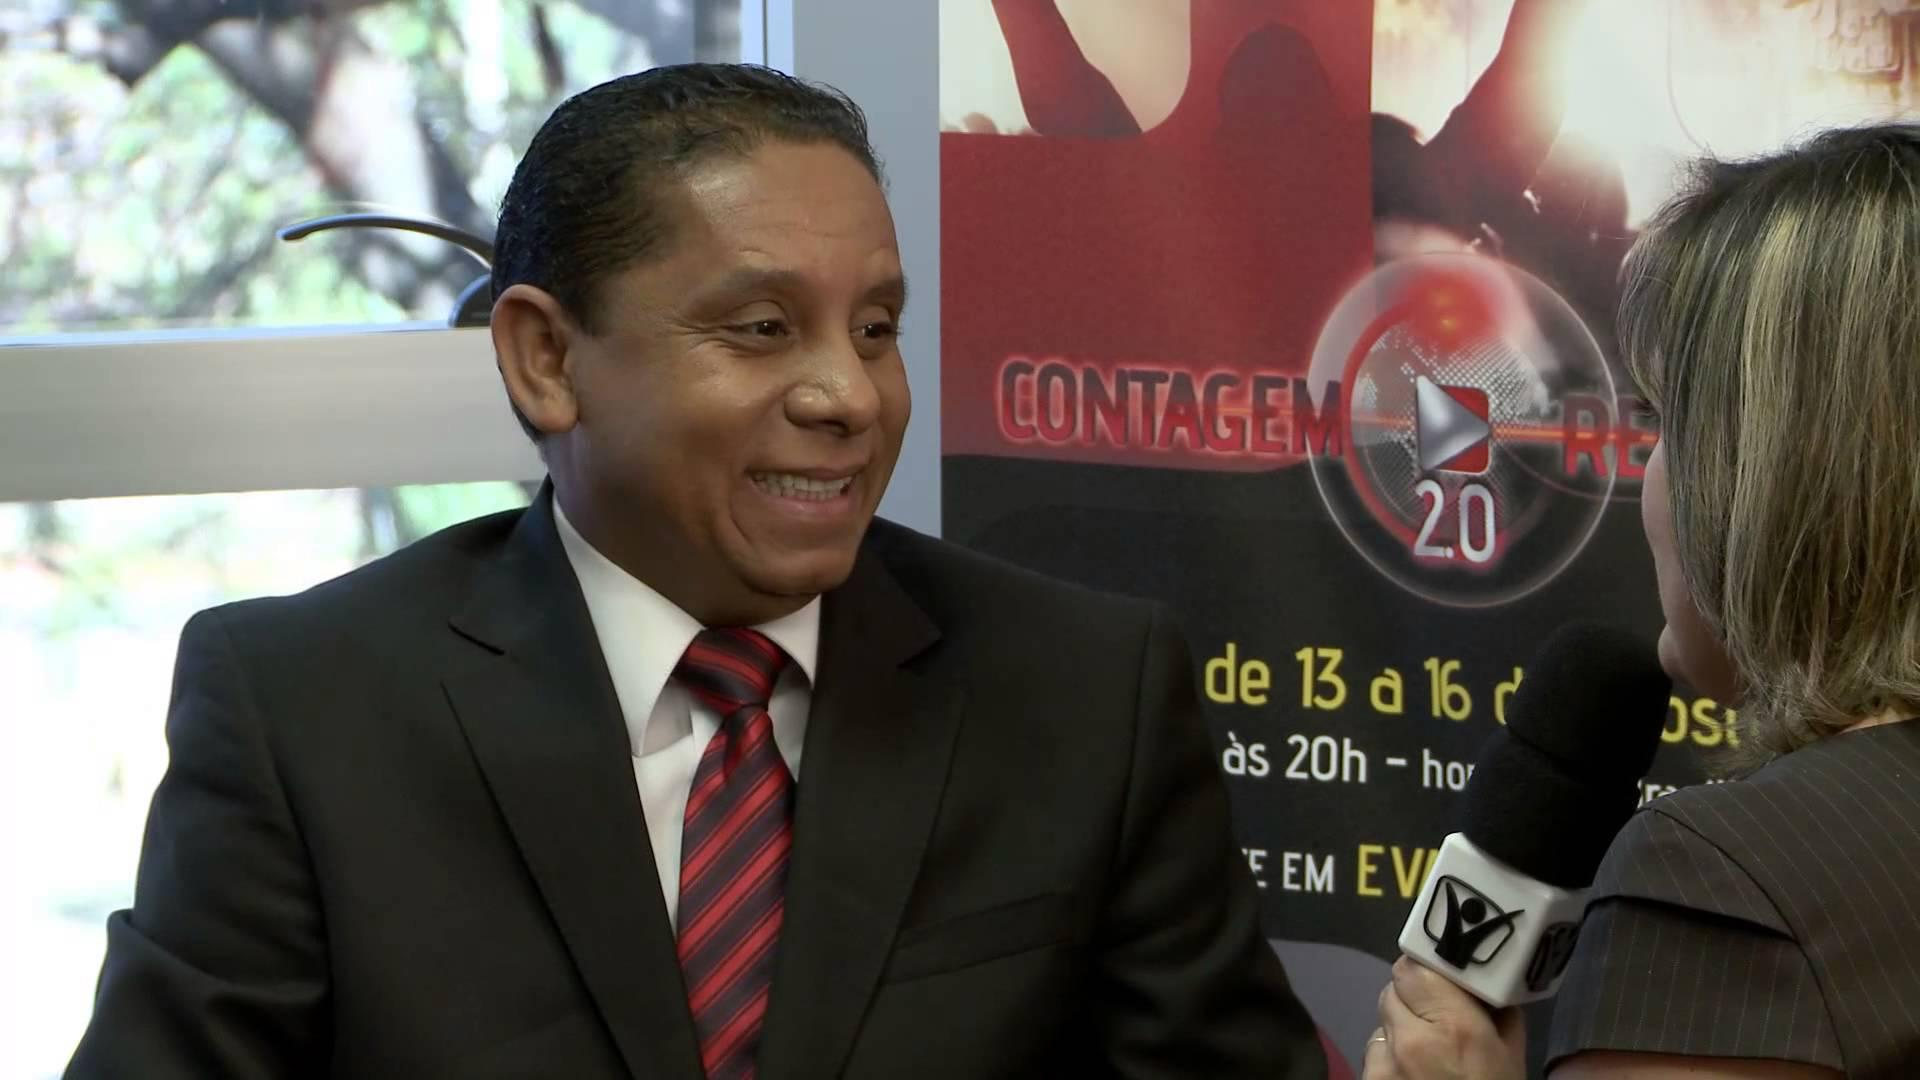 Notícias Adventistas – Contagem Regressiva – Pr. Luís Gonçalves